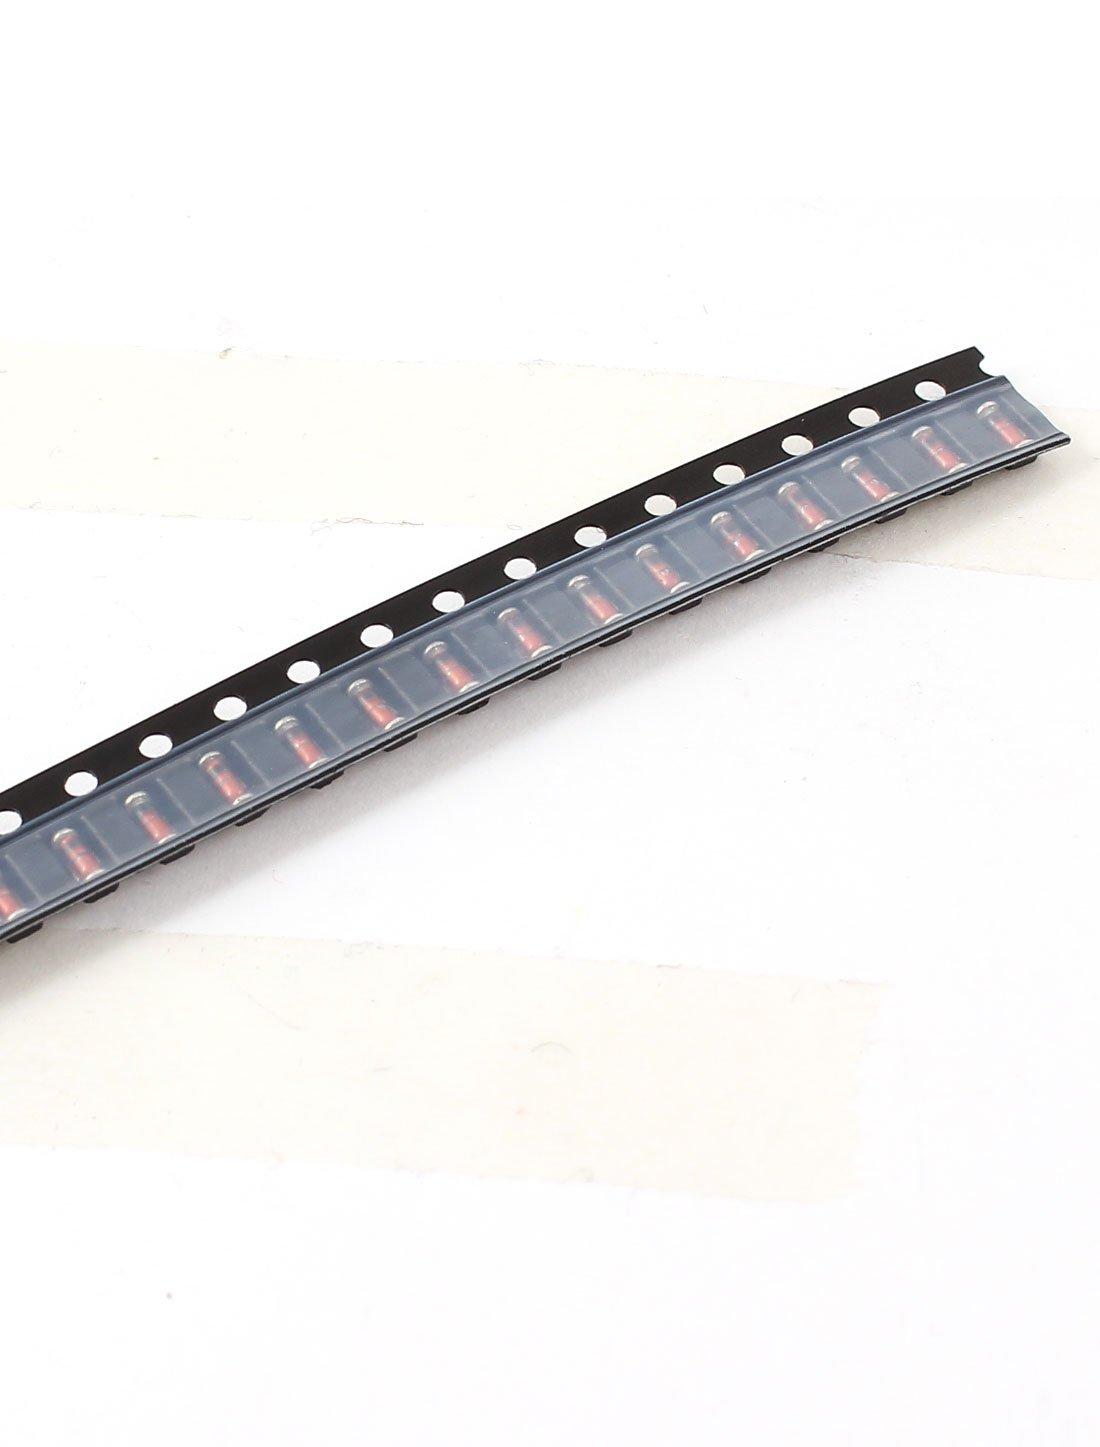 100 X LL4148 Diodo de conmutación 150mA 100V